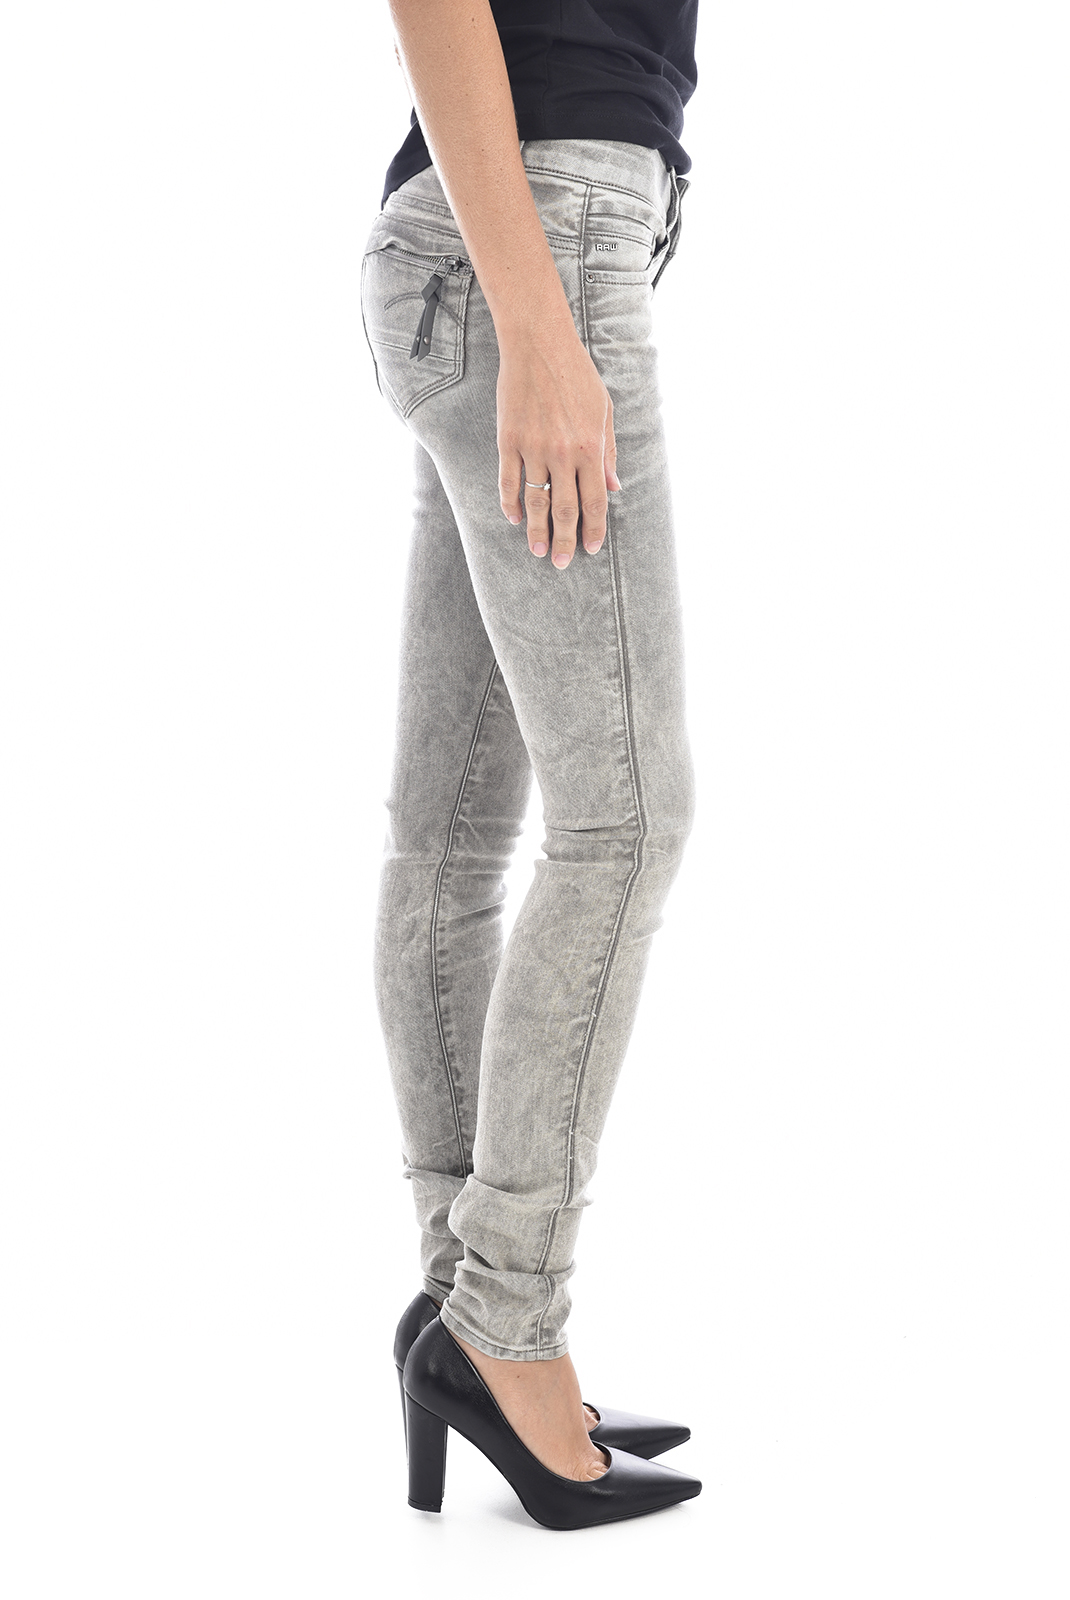 Jeans   G-star 60883-6750-5214 midge cody gris